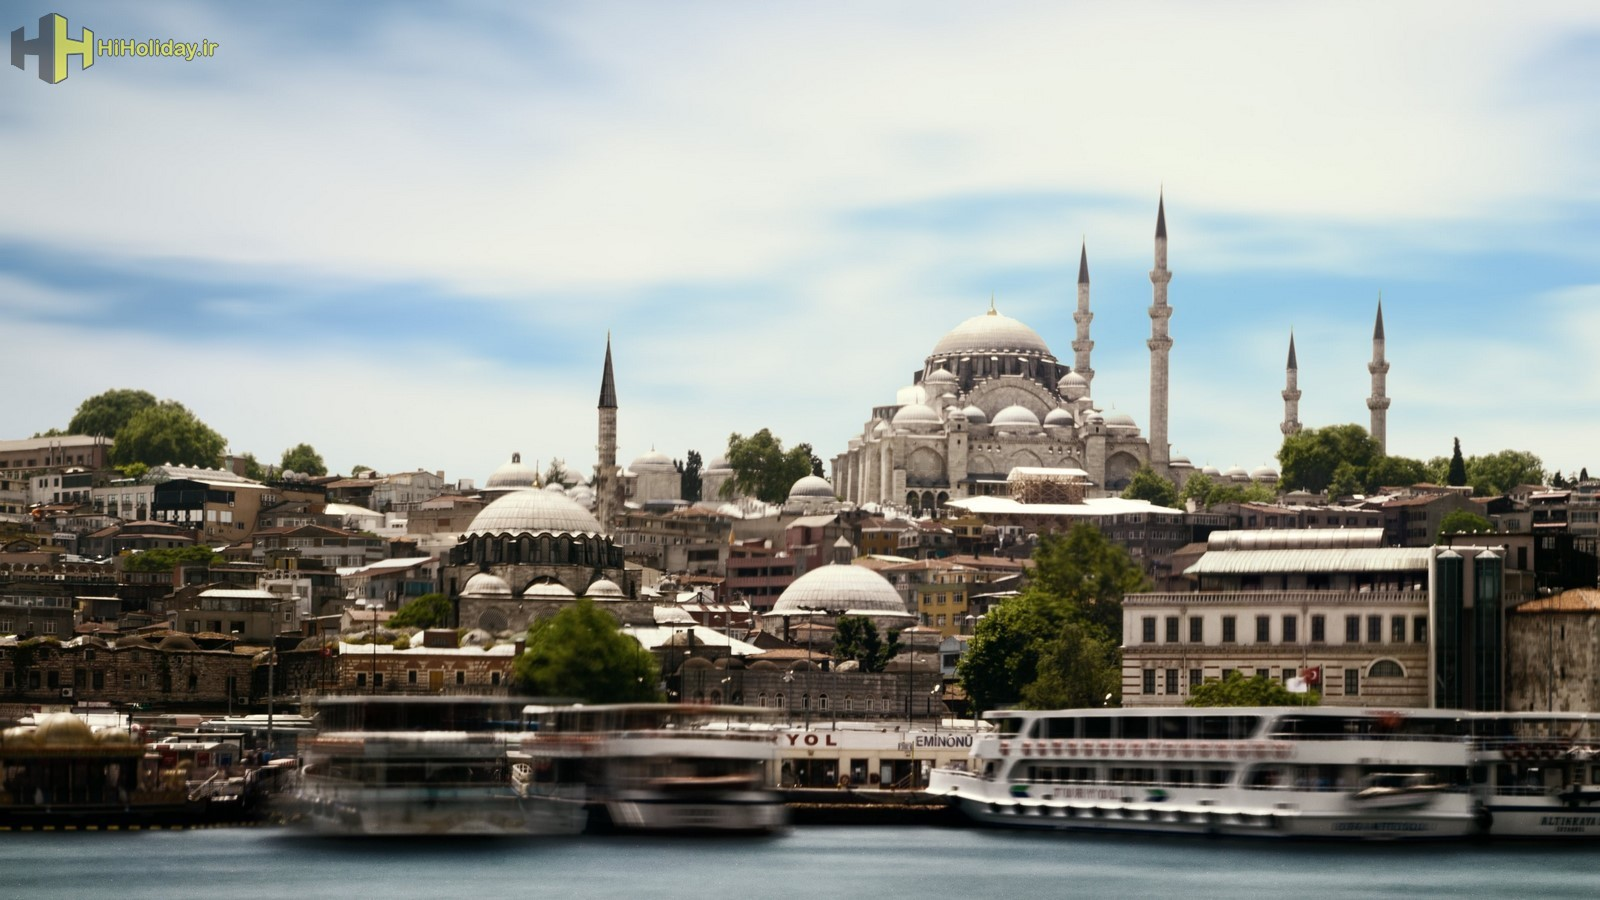 تور استانبول ویژه نوروز 3 شب و 4 روز